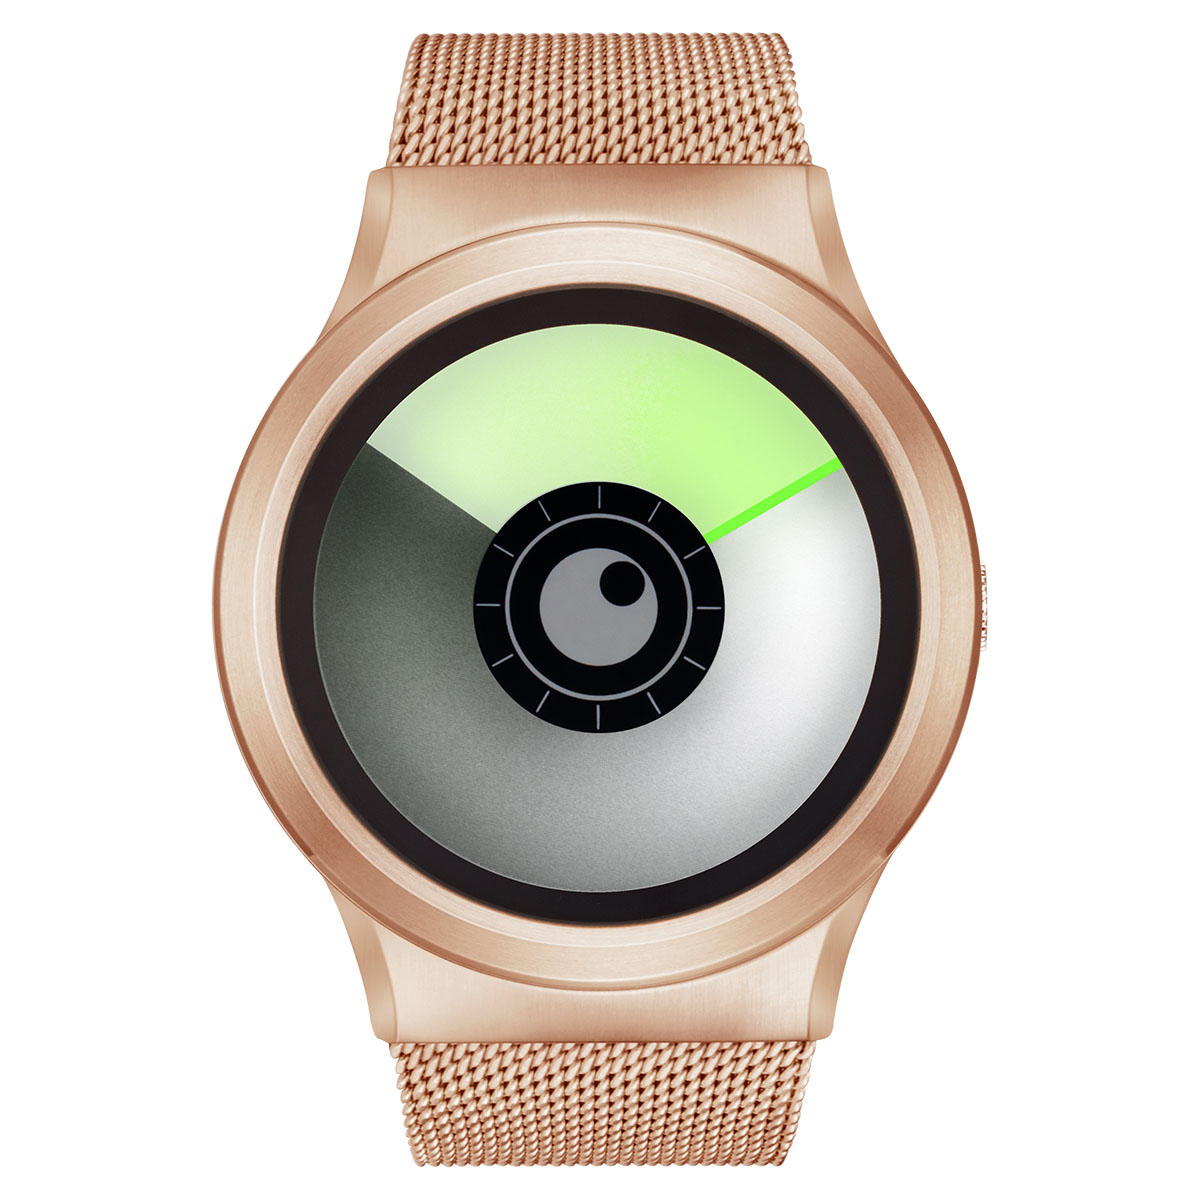 ZEROO AURORA BOREALIS ゼロ 電池式クォーツ 腕時計 [W12022B05SM05] グリーン デザインウォッチ ペア用 メンズ レディース ユニセックス おしゃれ時計 デザイナーズ